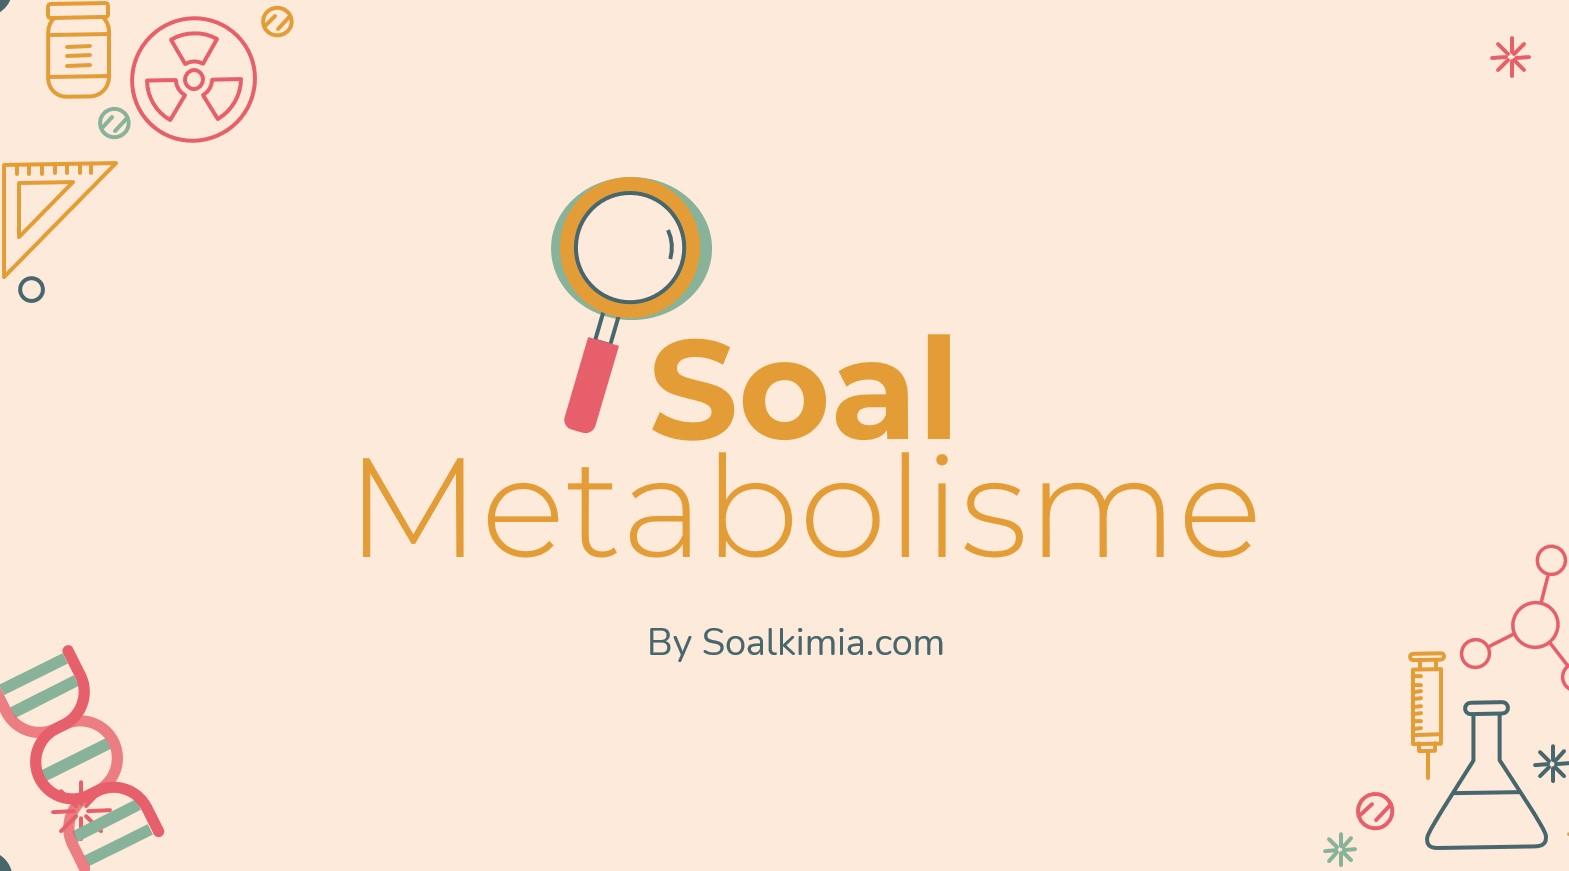 Soal metabolisme